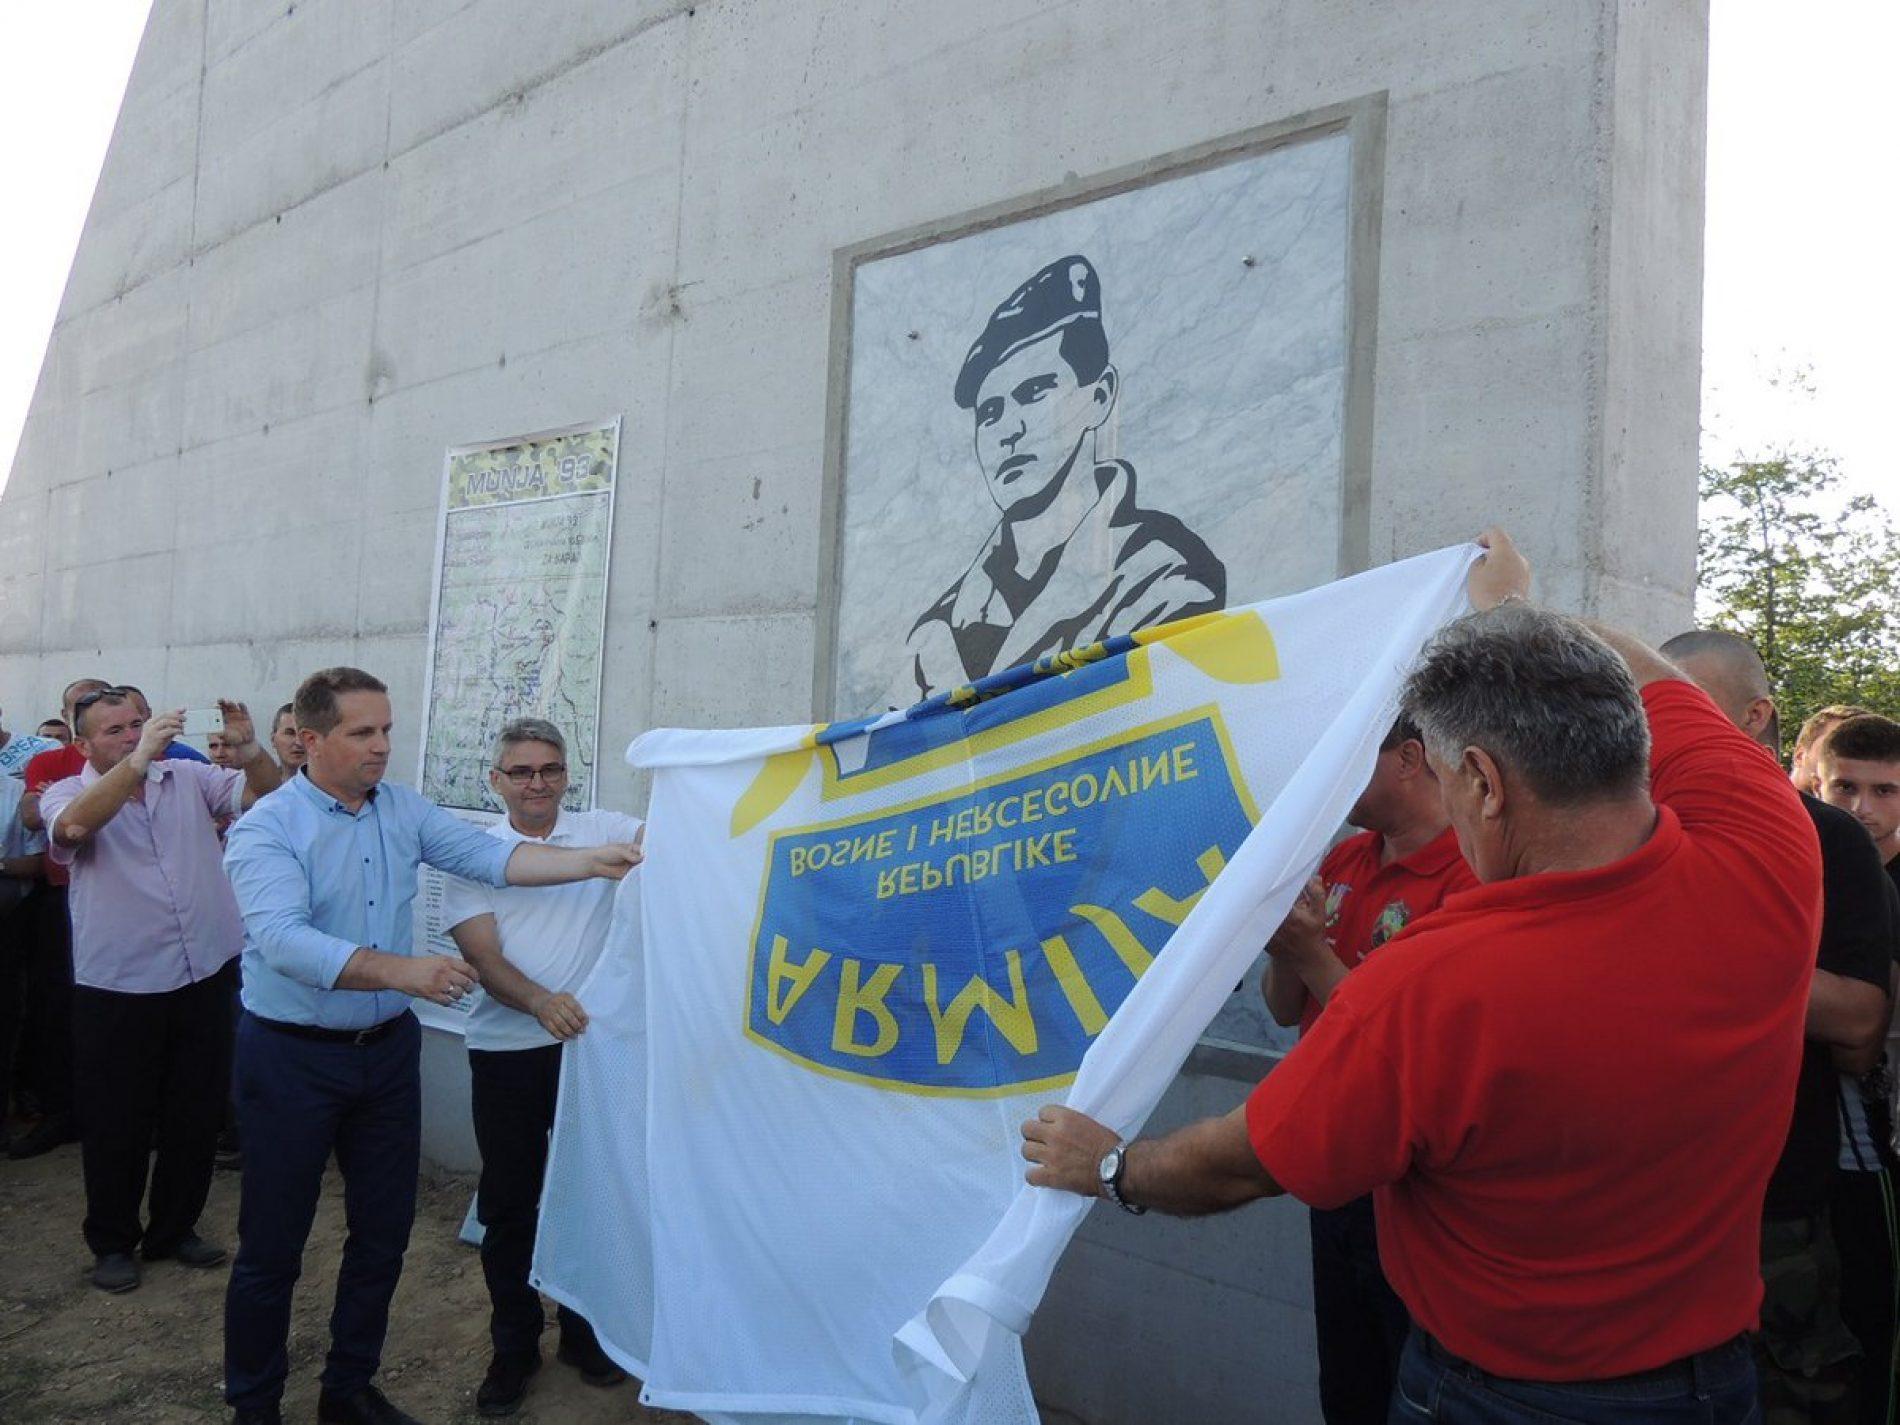 Bužim: Svečano otkriveno spomen-obilježje Ponosa i pobjede Armije Bosne i Hercegovine